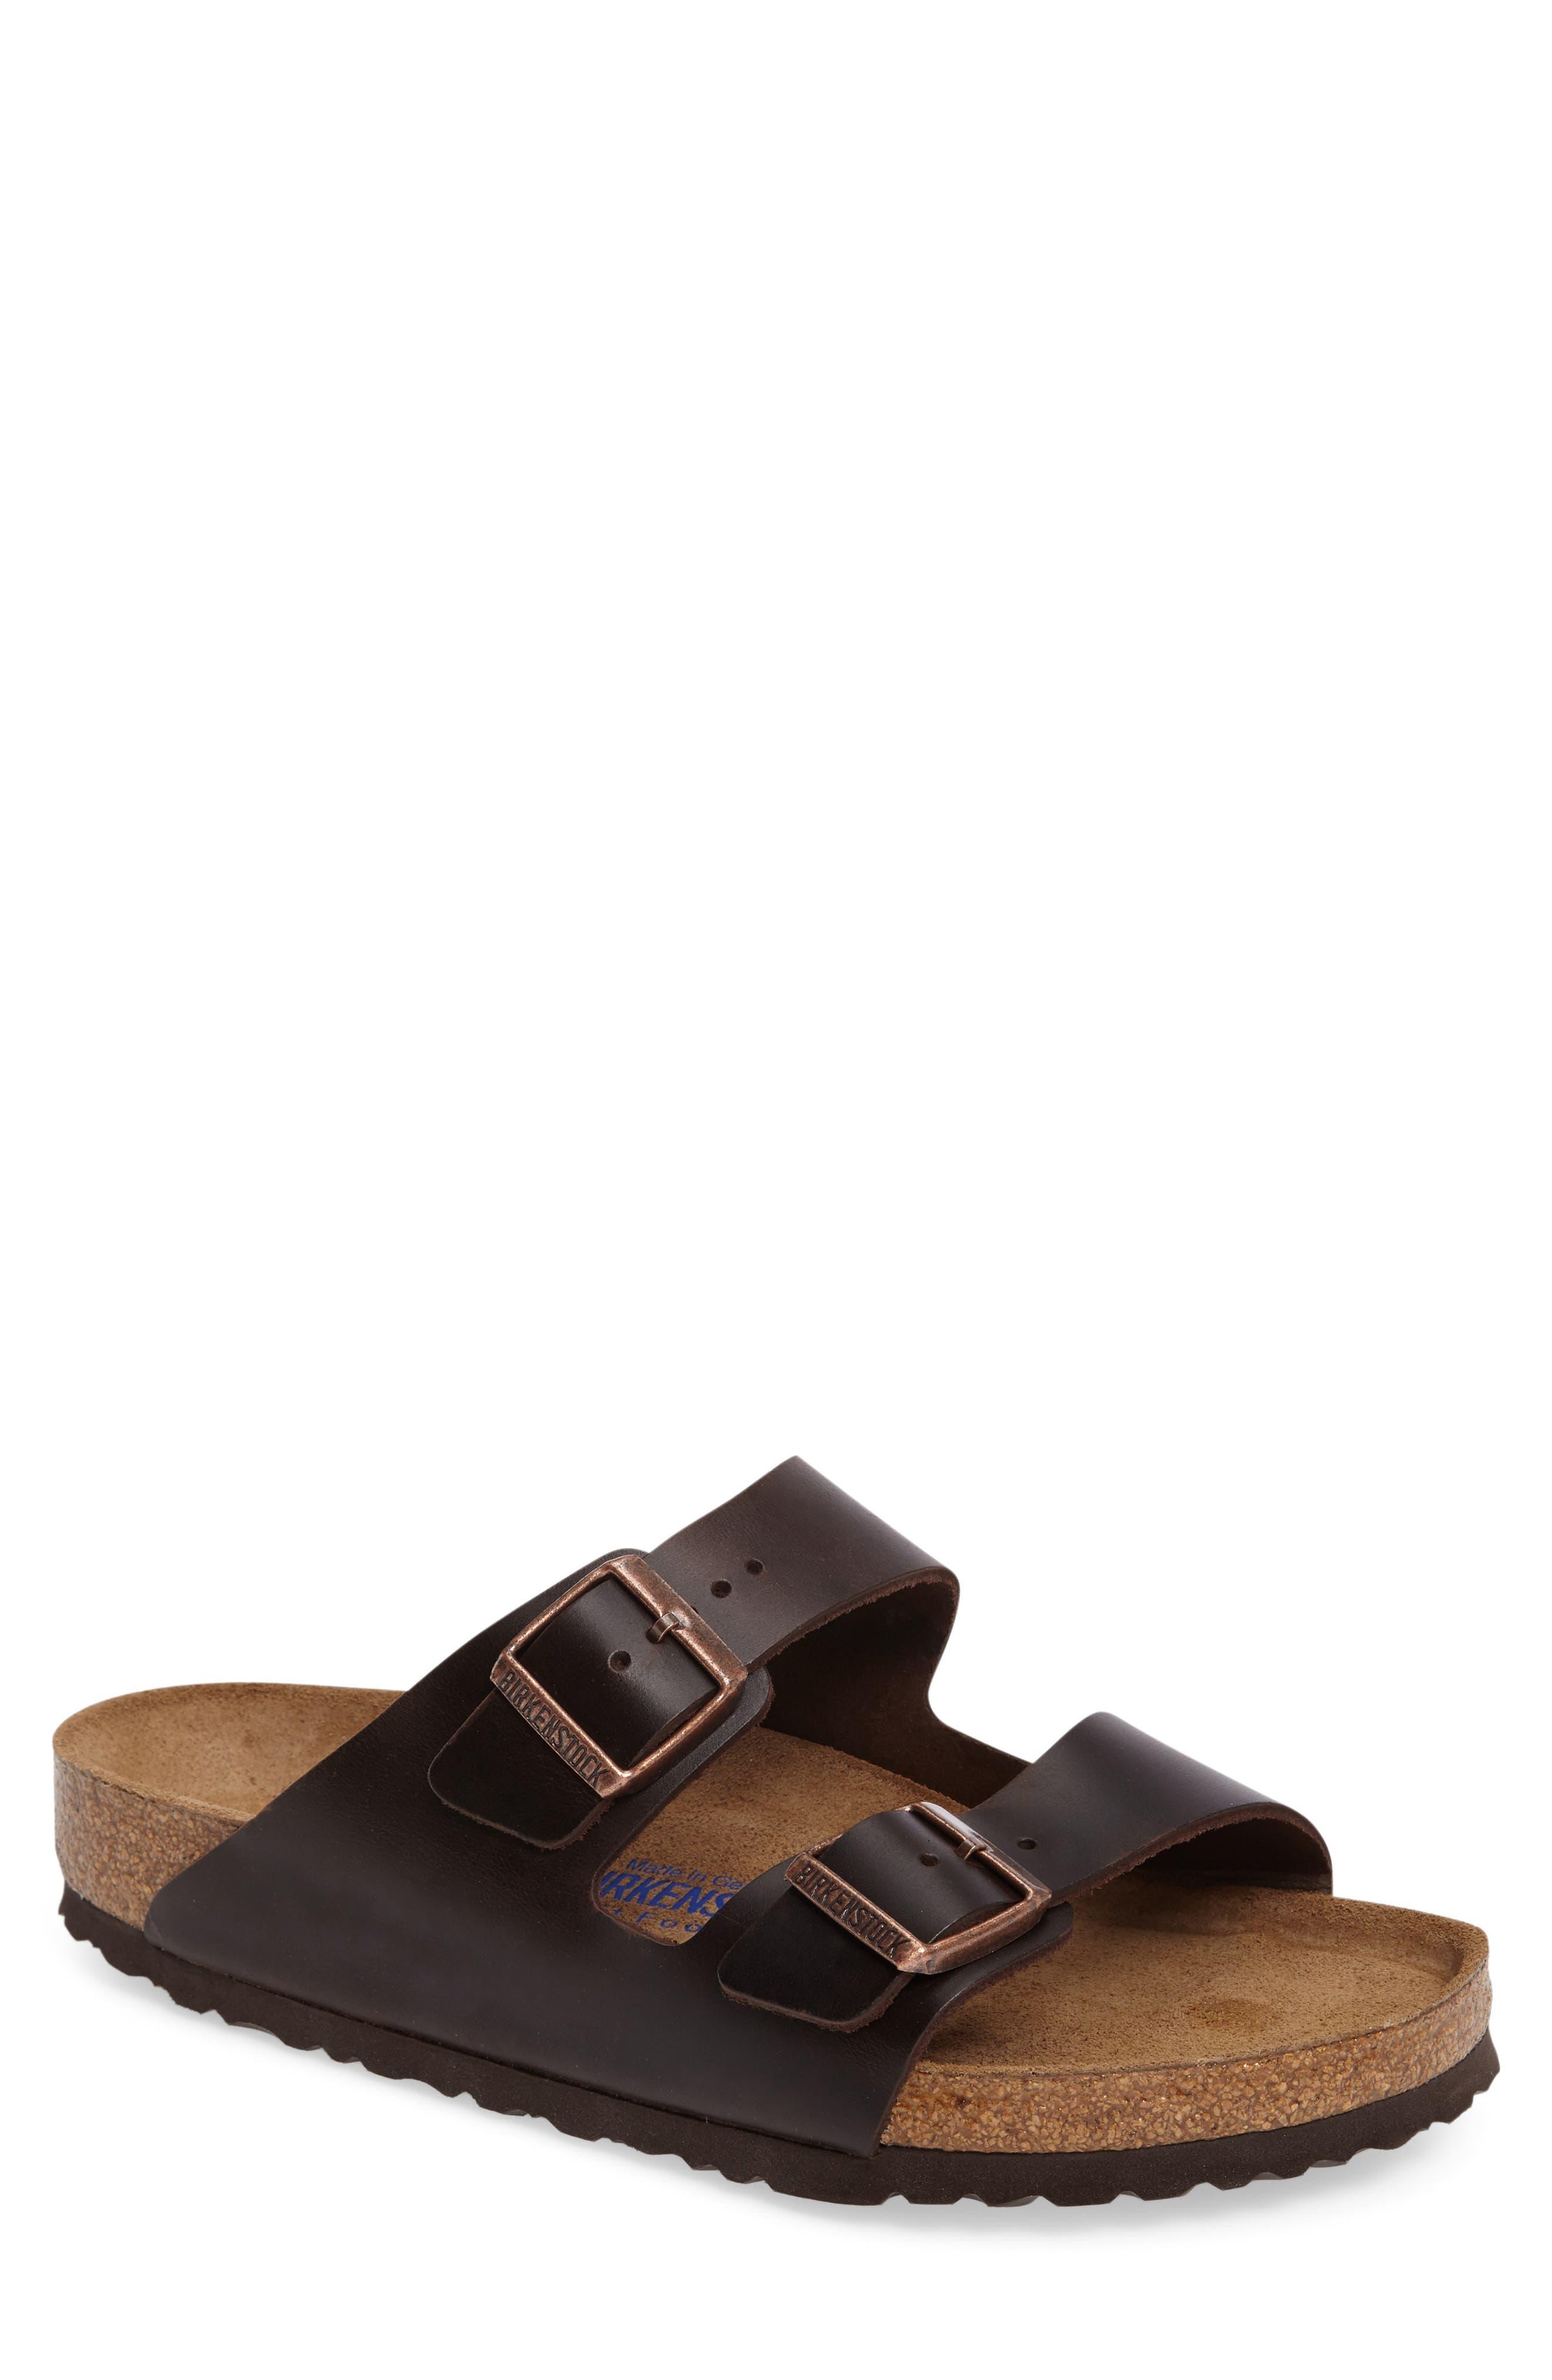 Sandals for Men On Sale, Black, Leather, 2017, 10.5 Givenchy